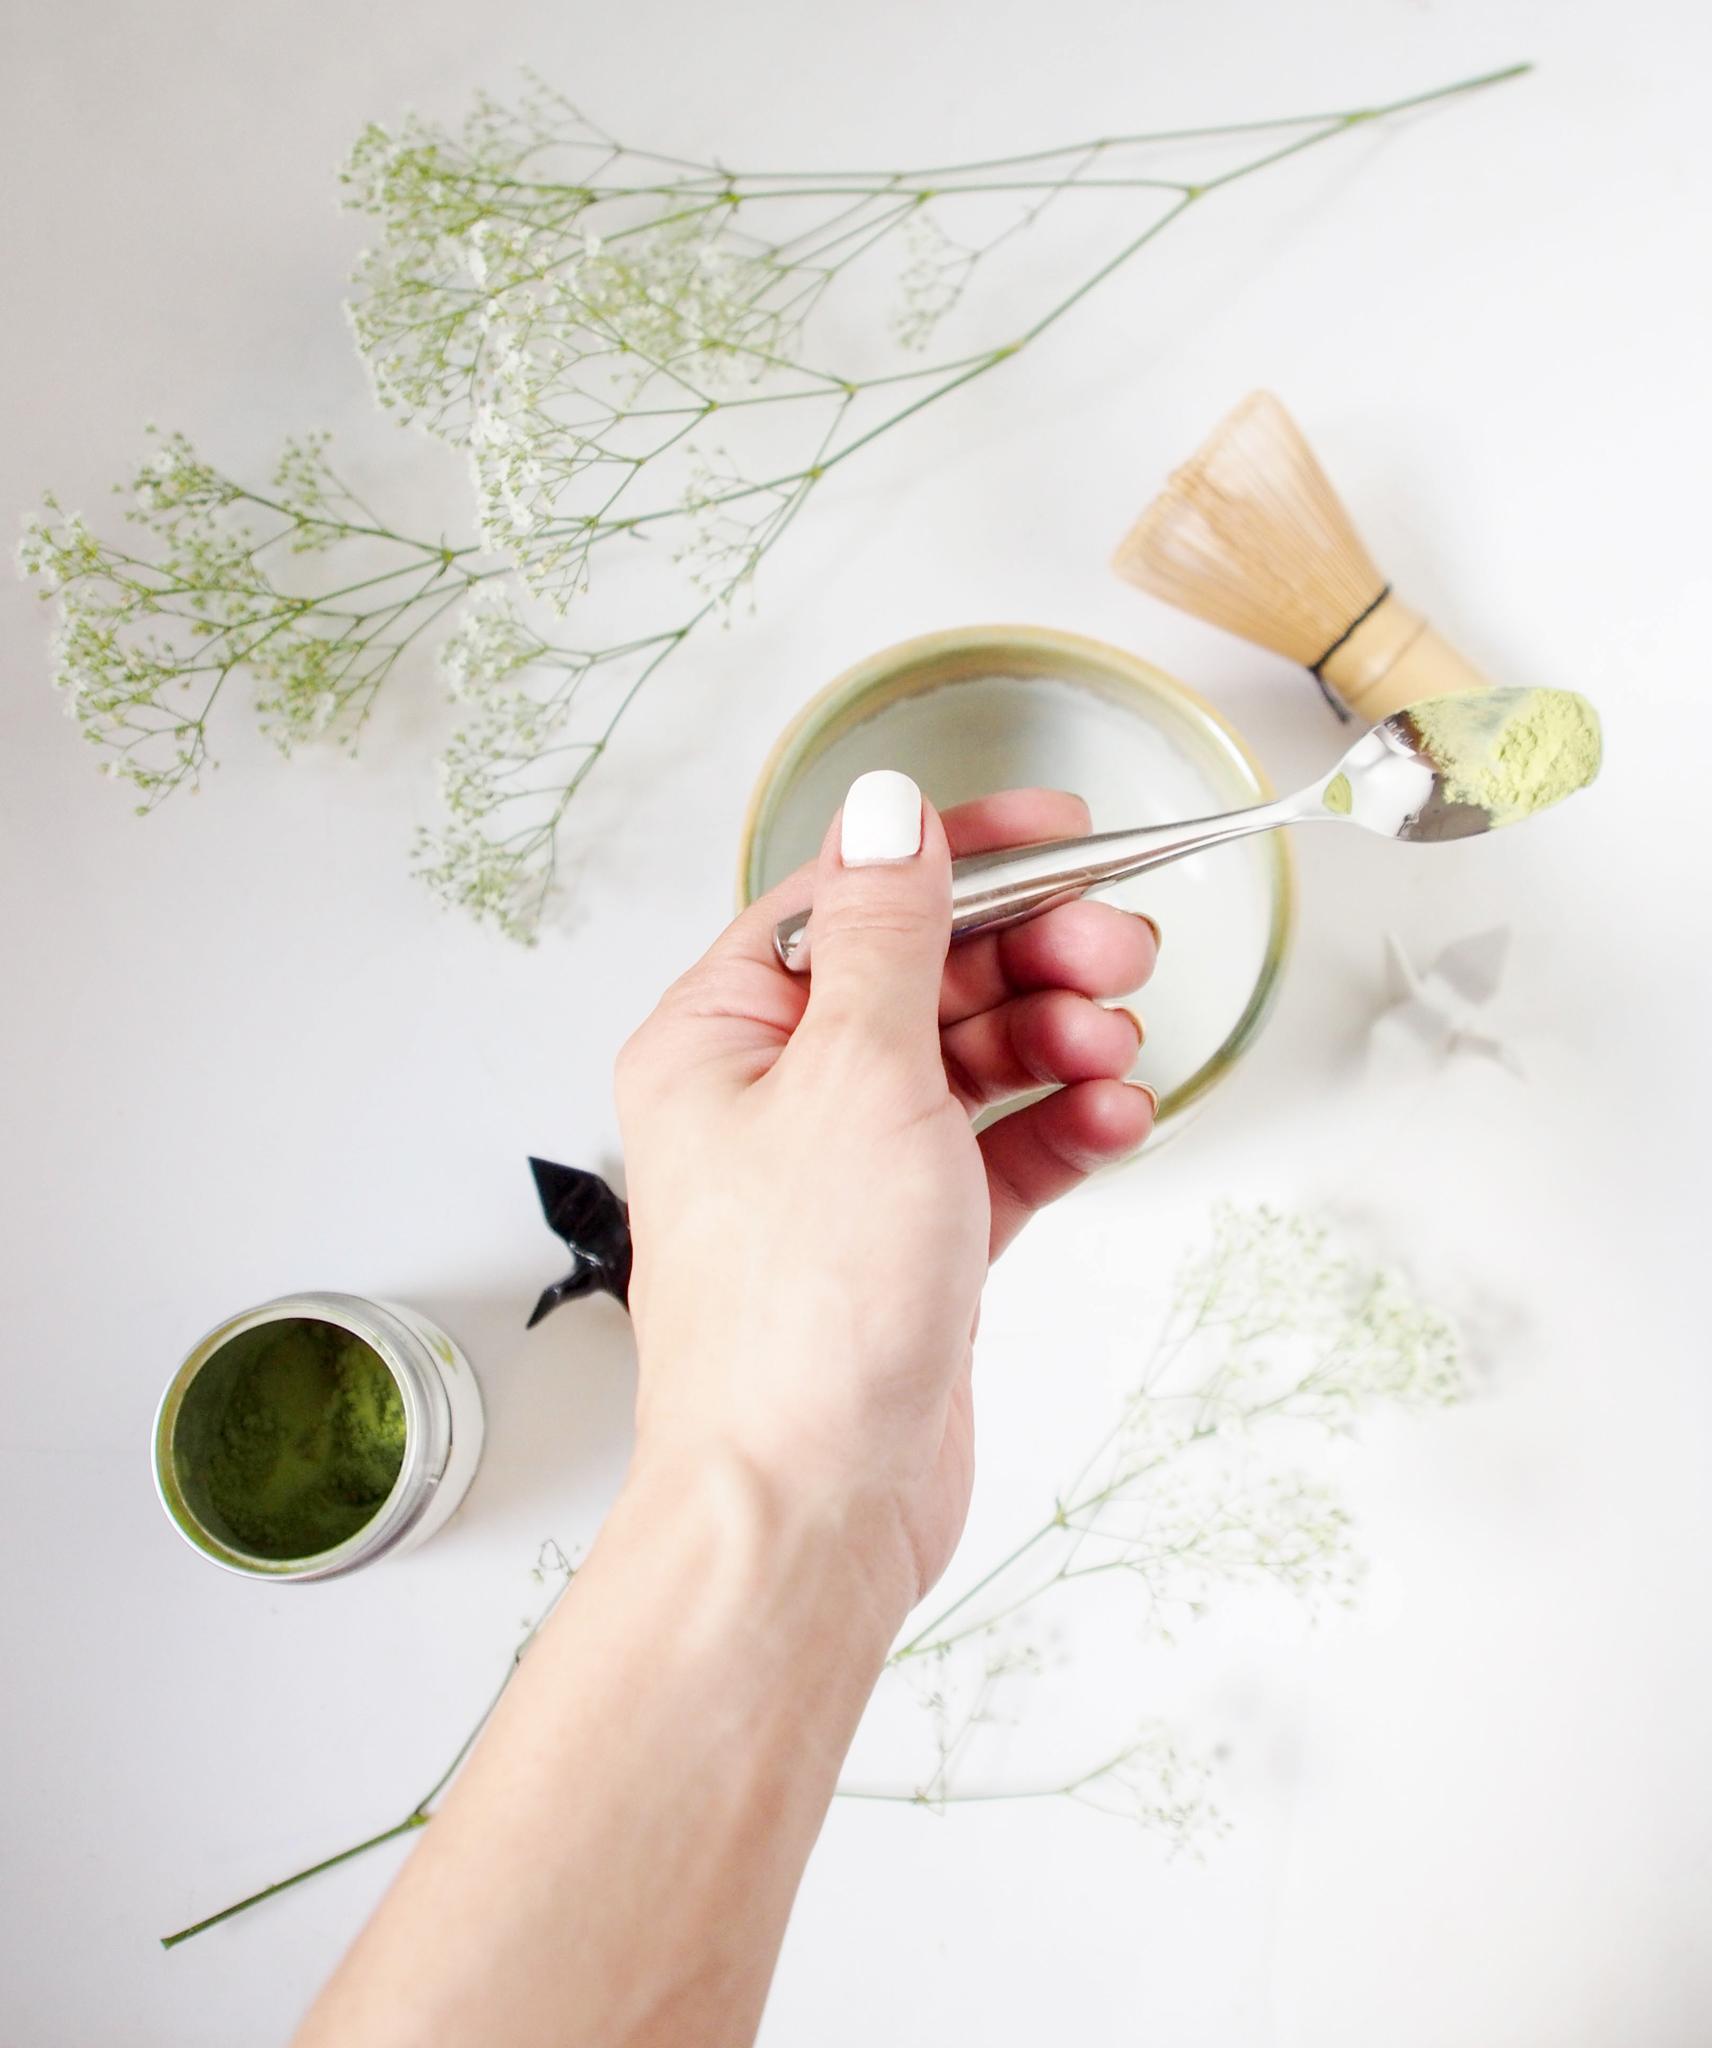 Next and last pick-up: a tea scoop (茶杓  chashaku)